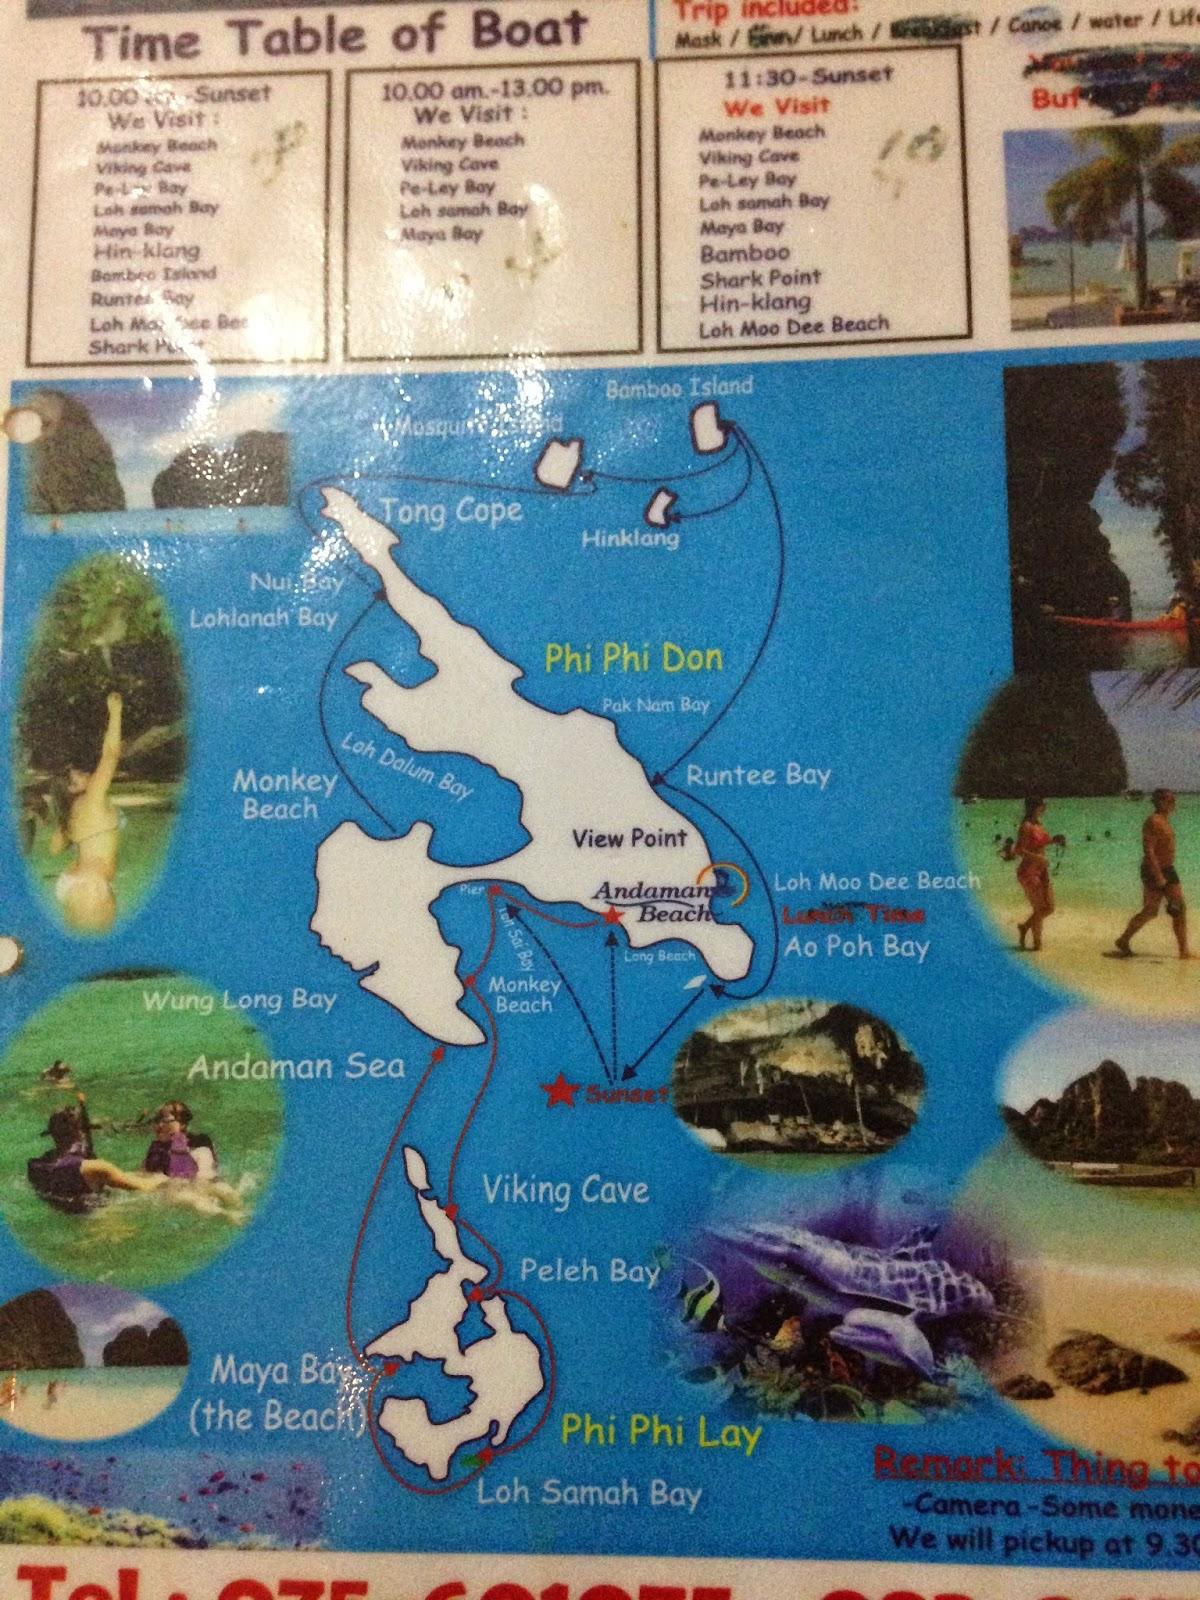 Passeio de Barco Maya Bay